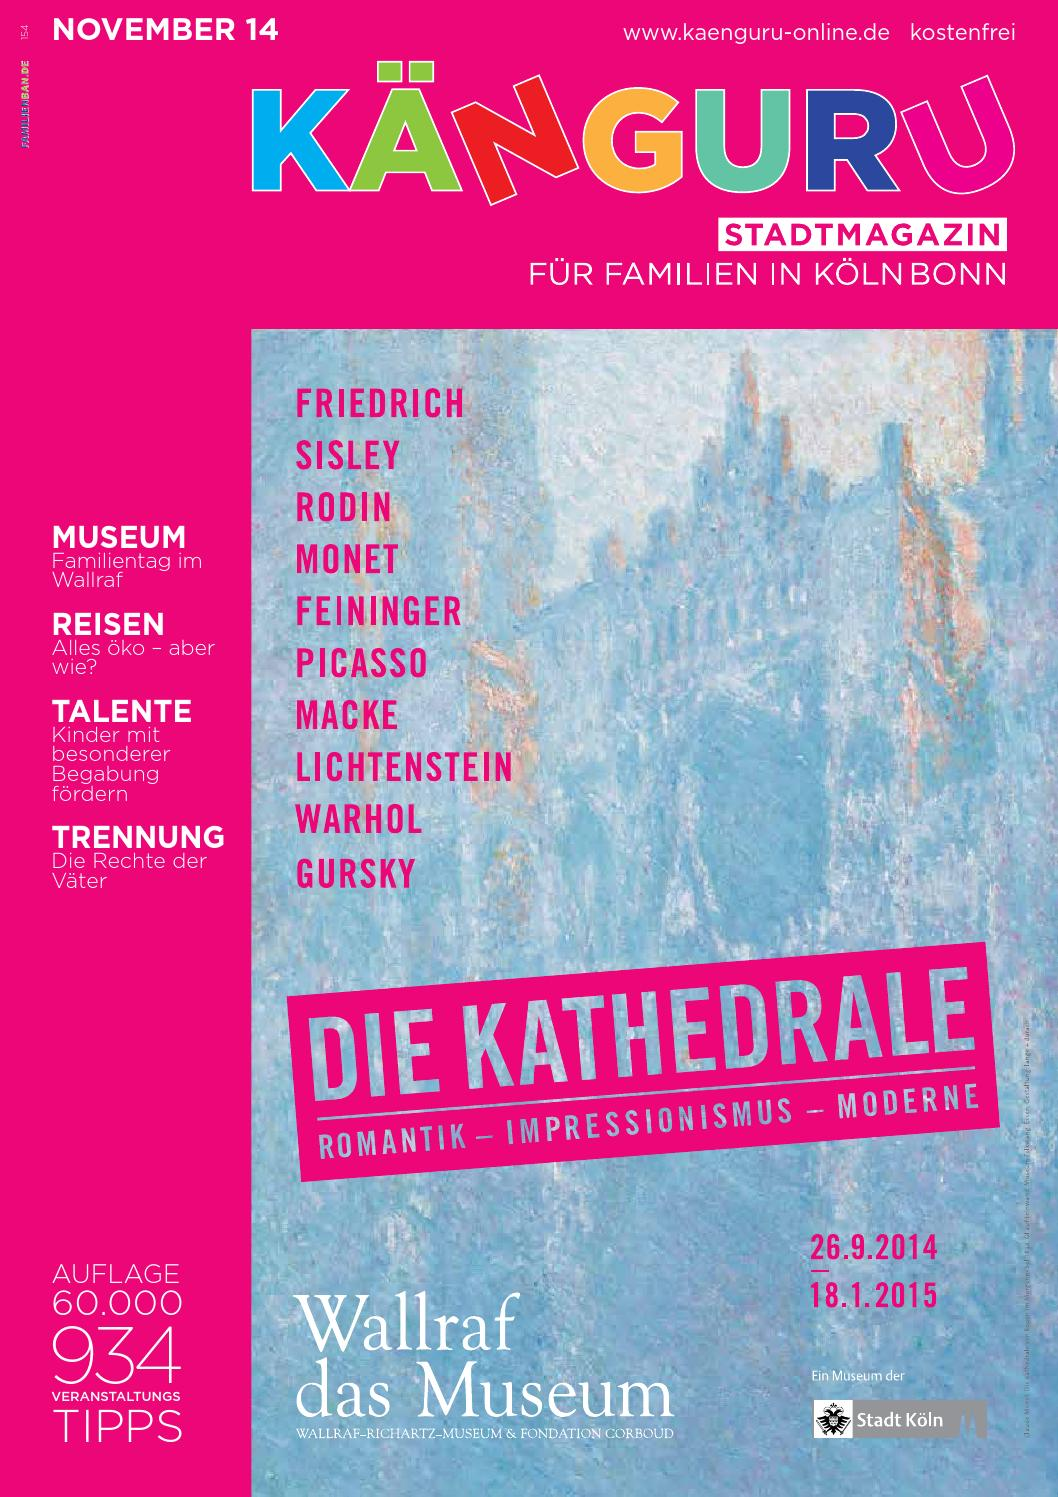 Känguru Stadtmagazin Für Familien In Kölnbonn November 2014